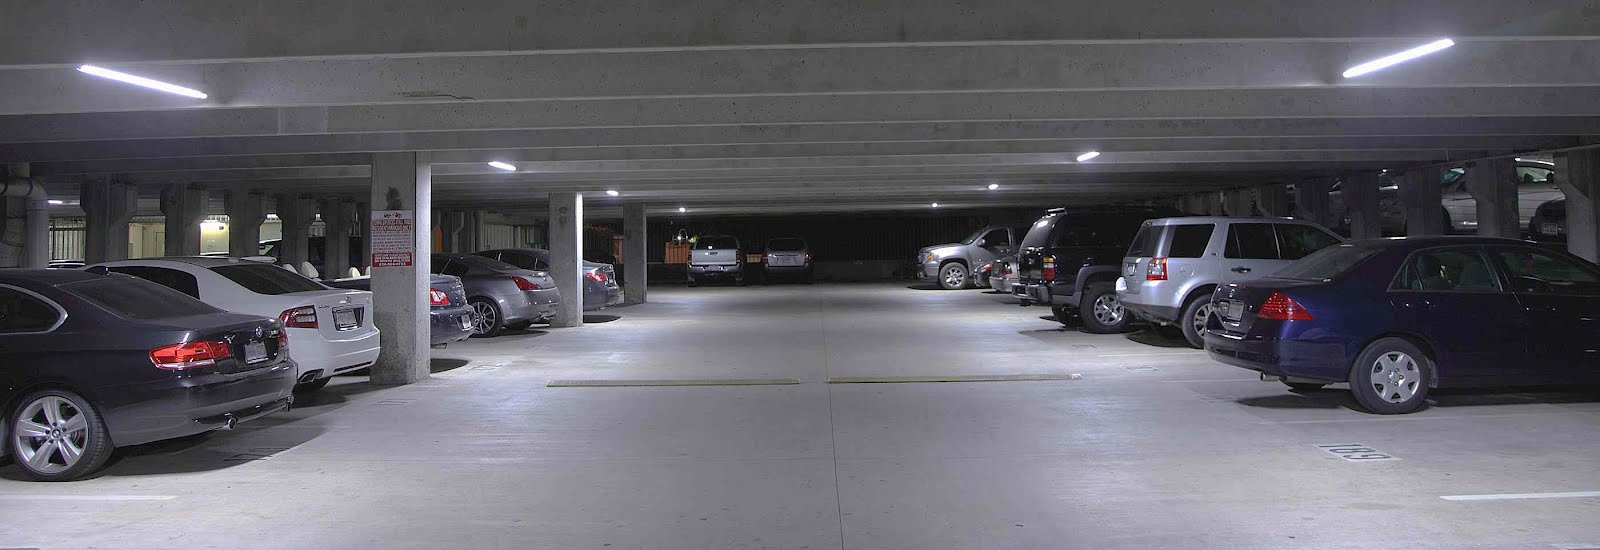 Parkade Amp Underground Parking Led Lighting Retrofit In